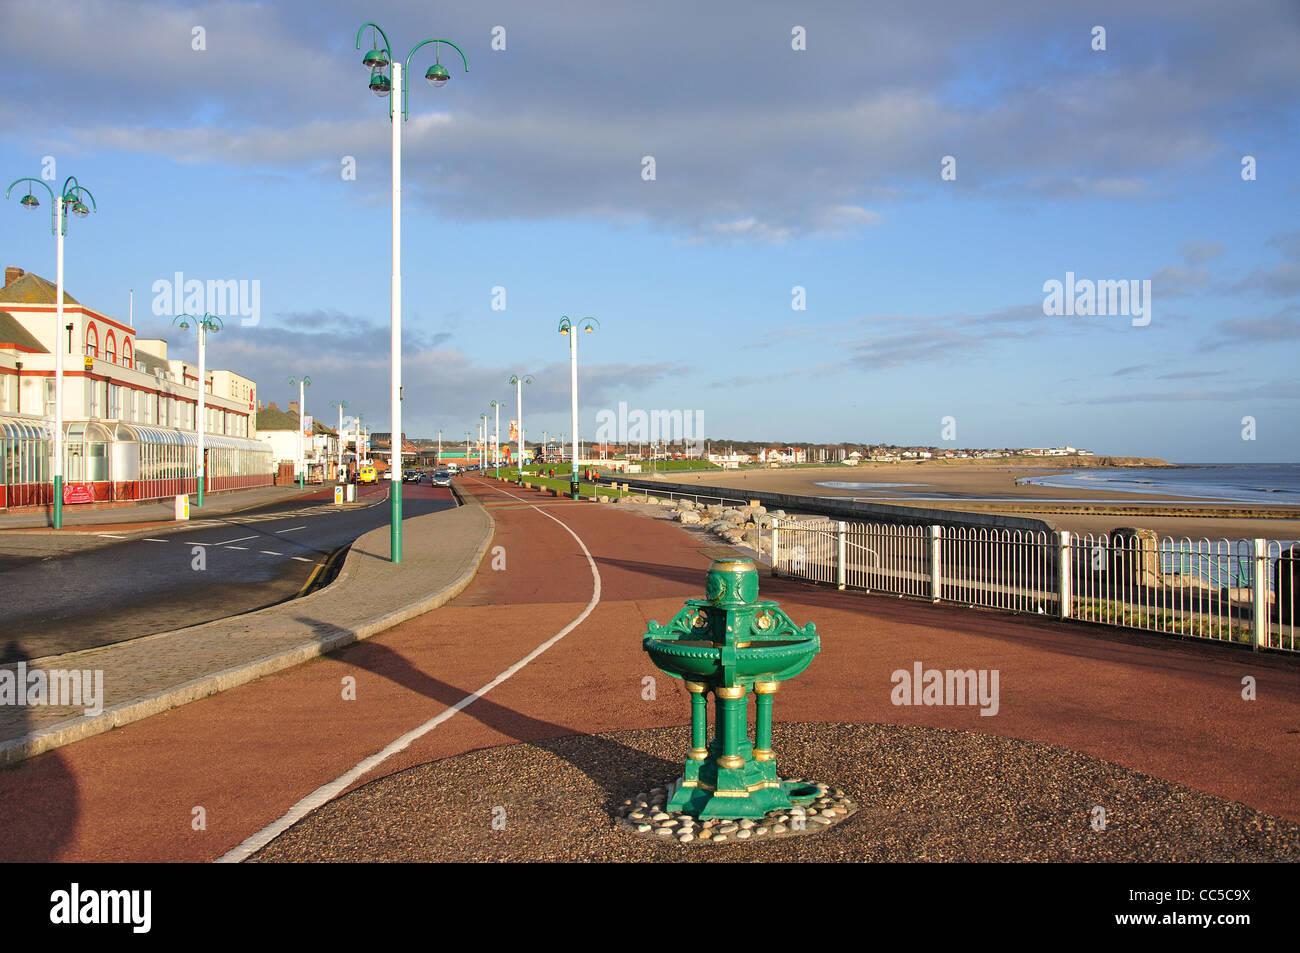 Beach and promenade view, Seaburn, Sunderland, Tyne and Wear, England, United Kingdom Stock Photo